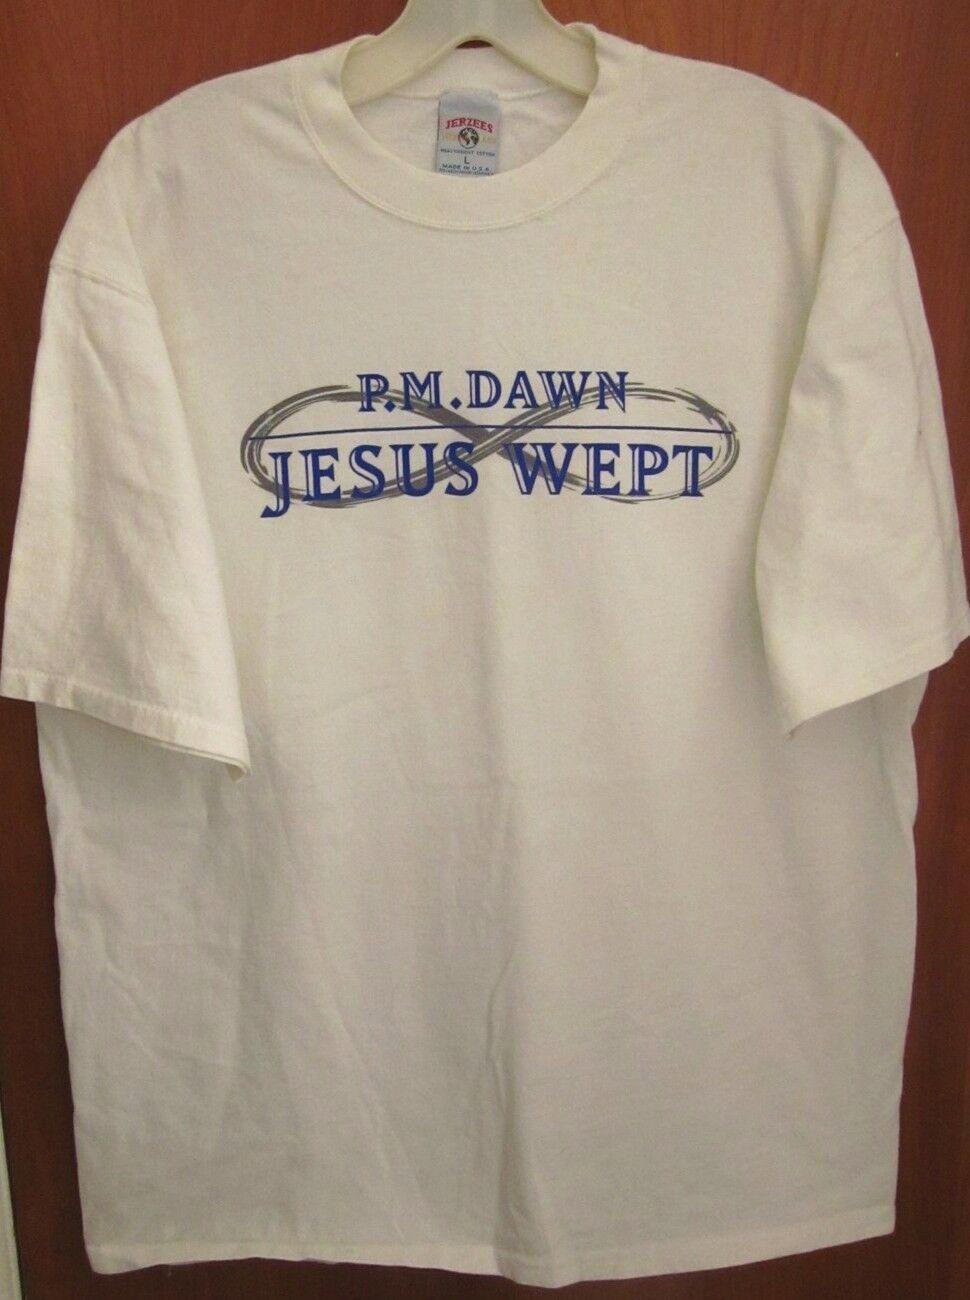 PM DAWN Jesus Wept lrg T shirt hip hop R&B Gee Street rap tee 1995 Prince Be